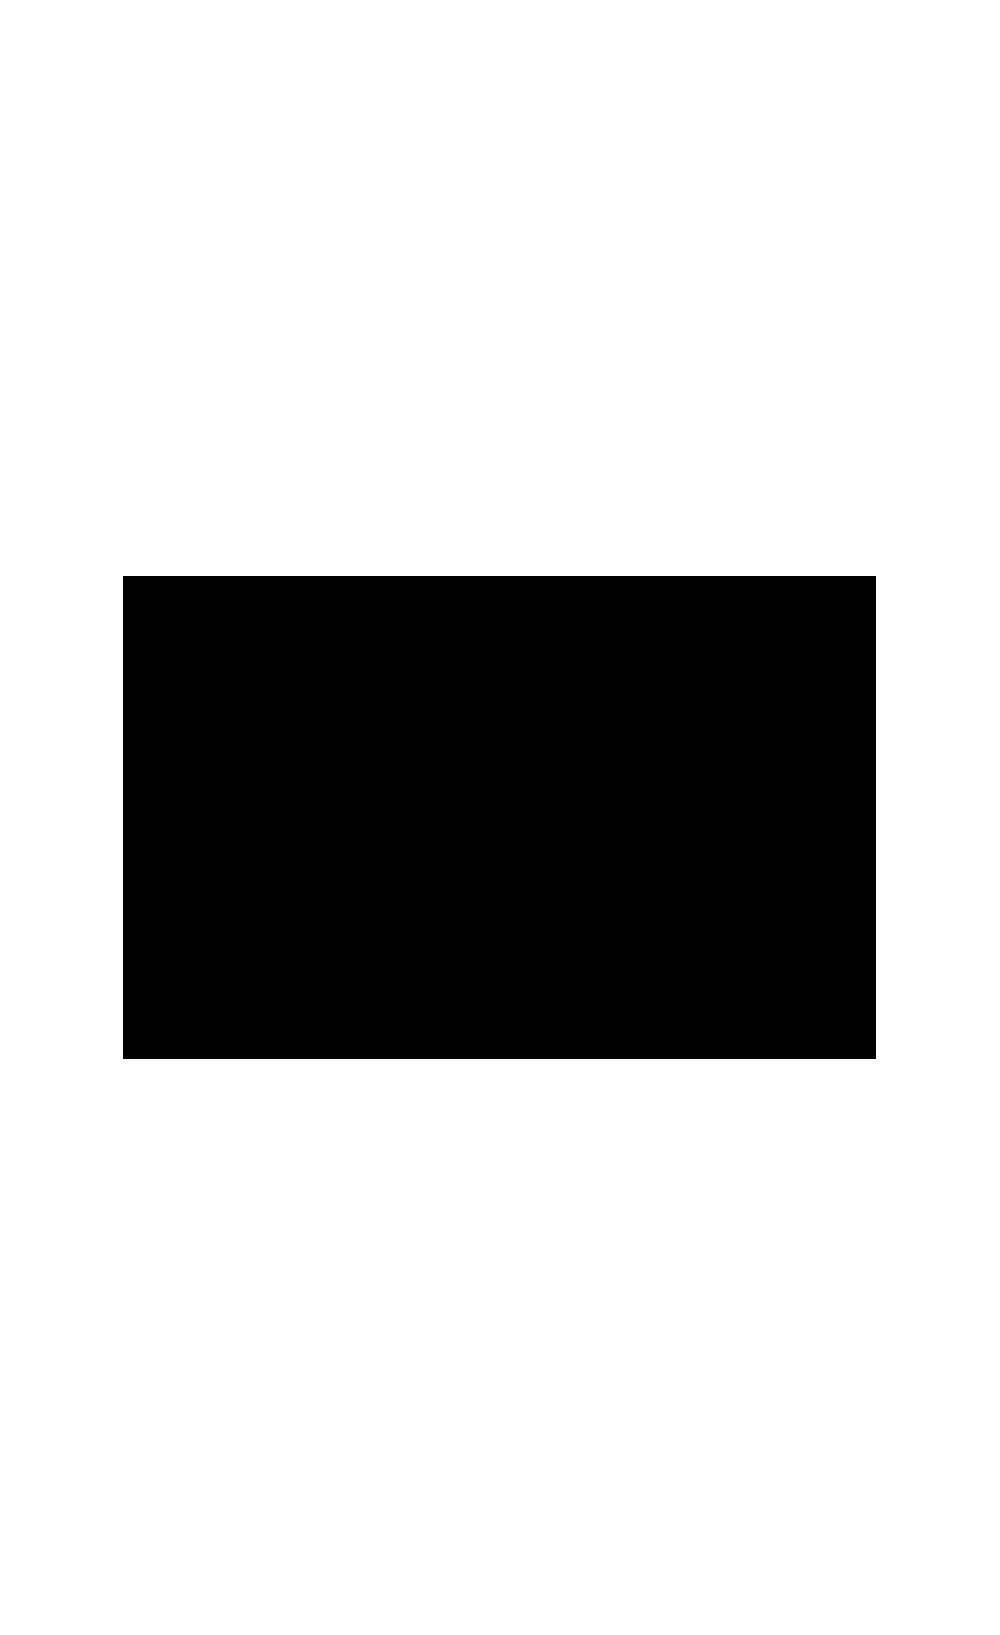 Sticker motif baroque vinyz for Motif dessin